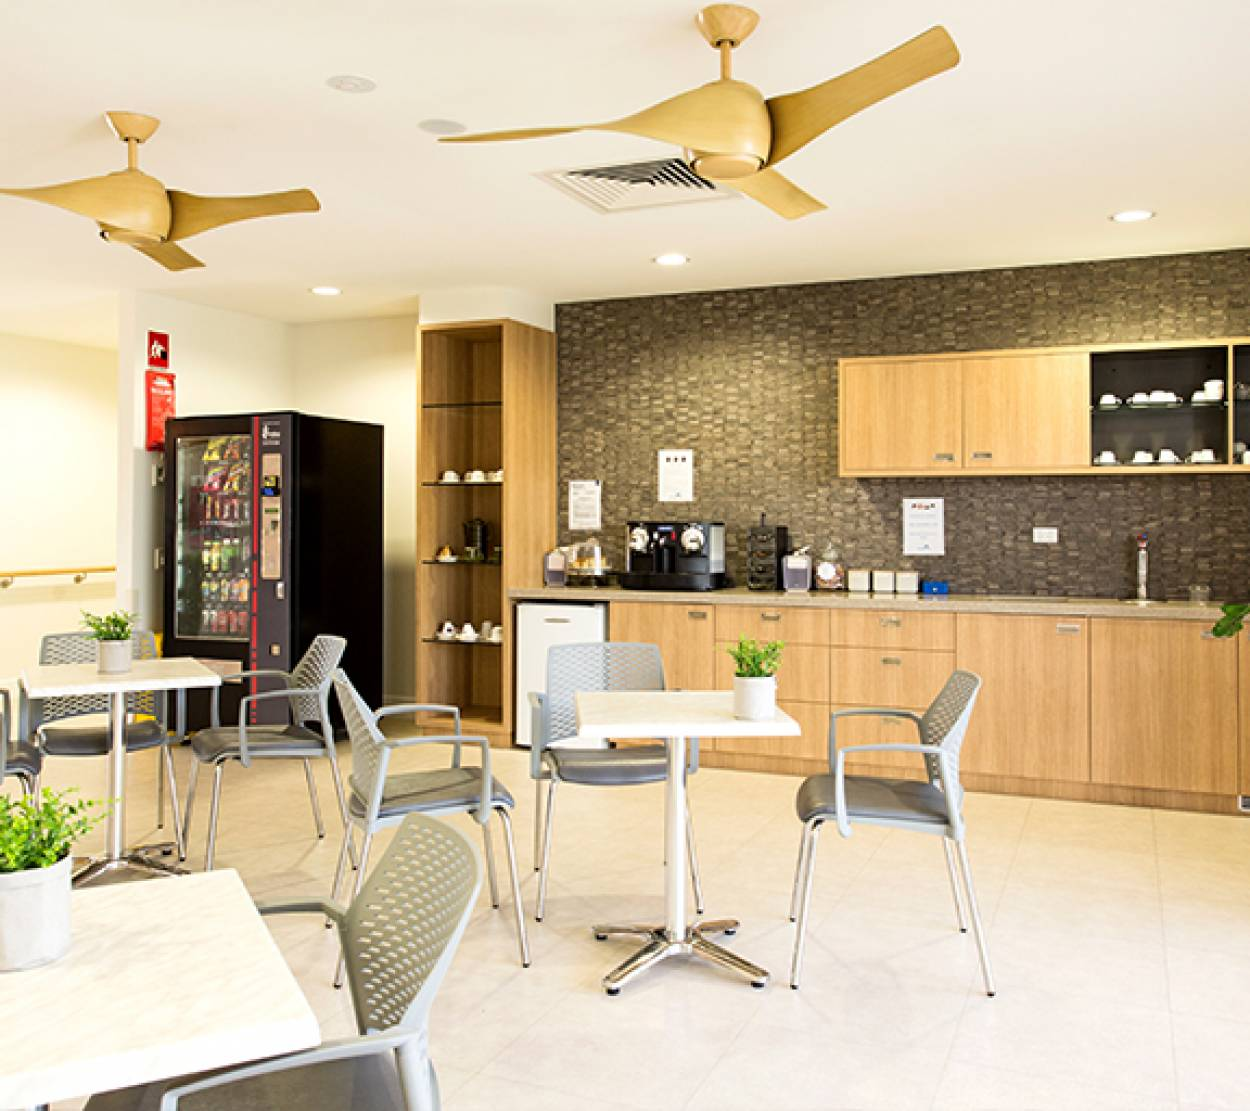 Bolton Clarke Glendale, Townsville